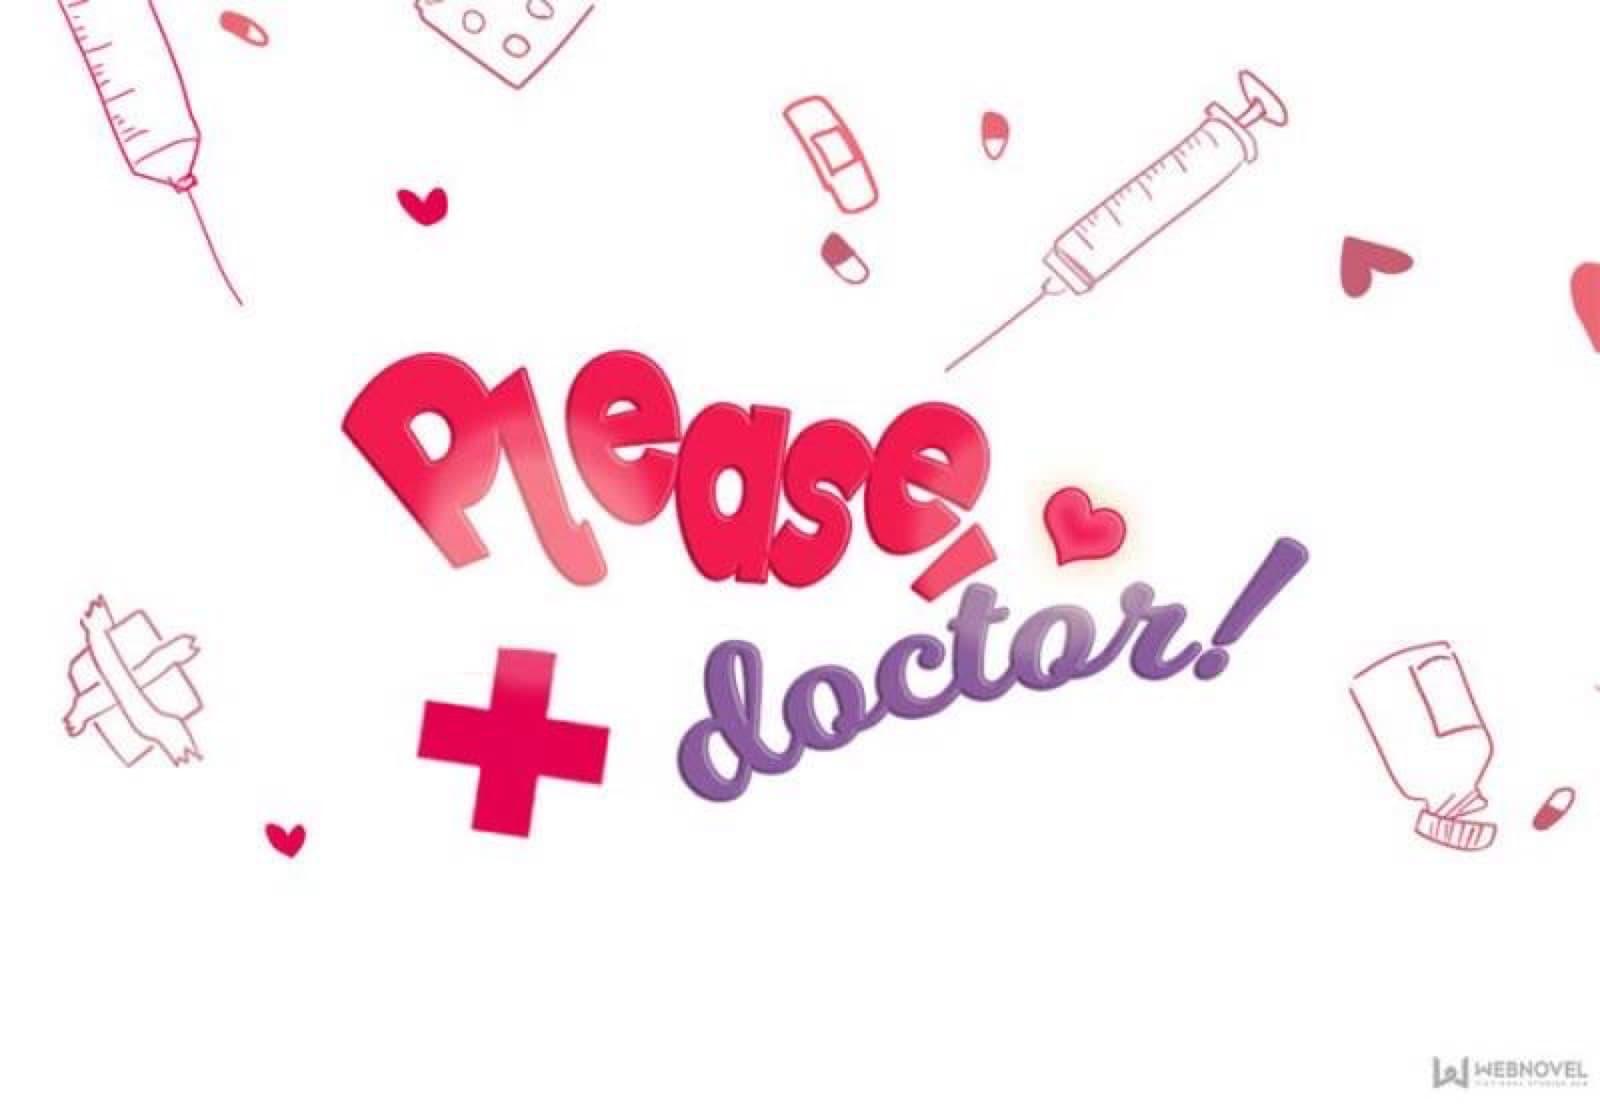 Please! Doctor!